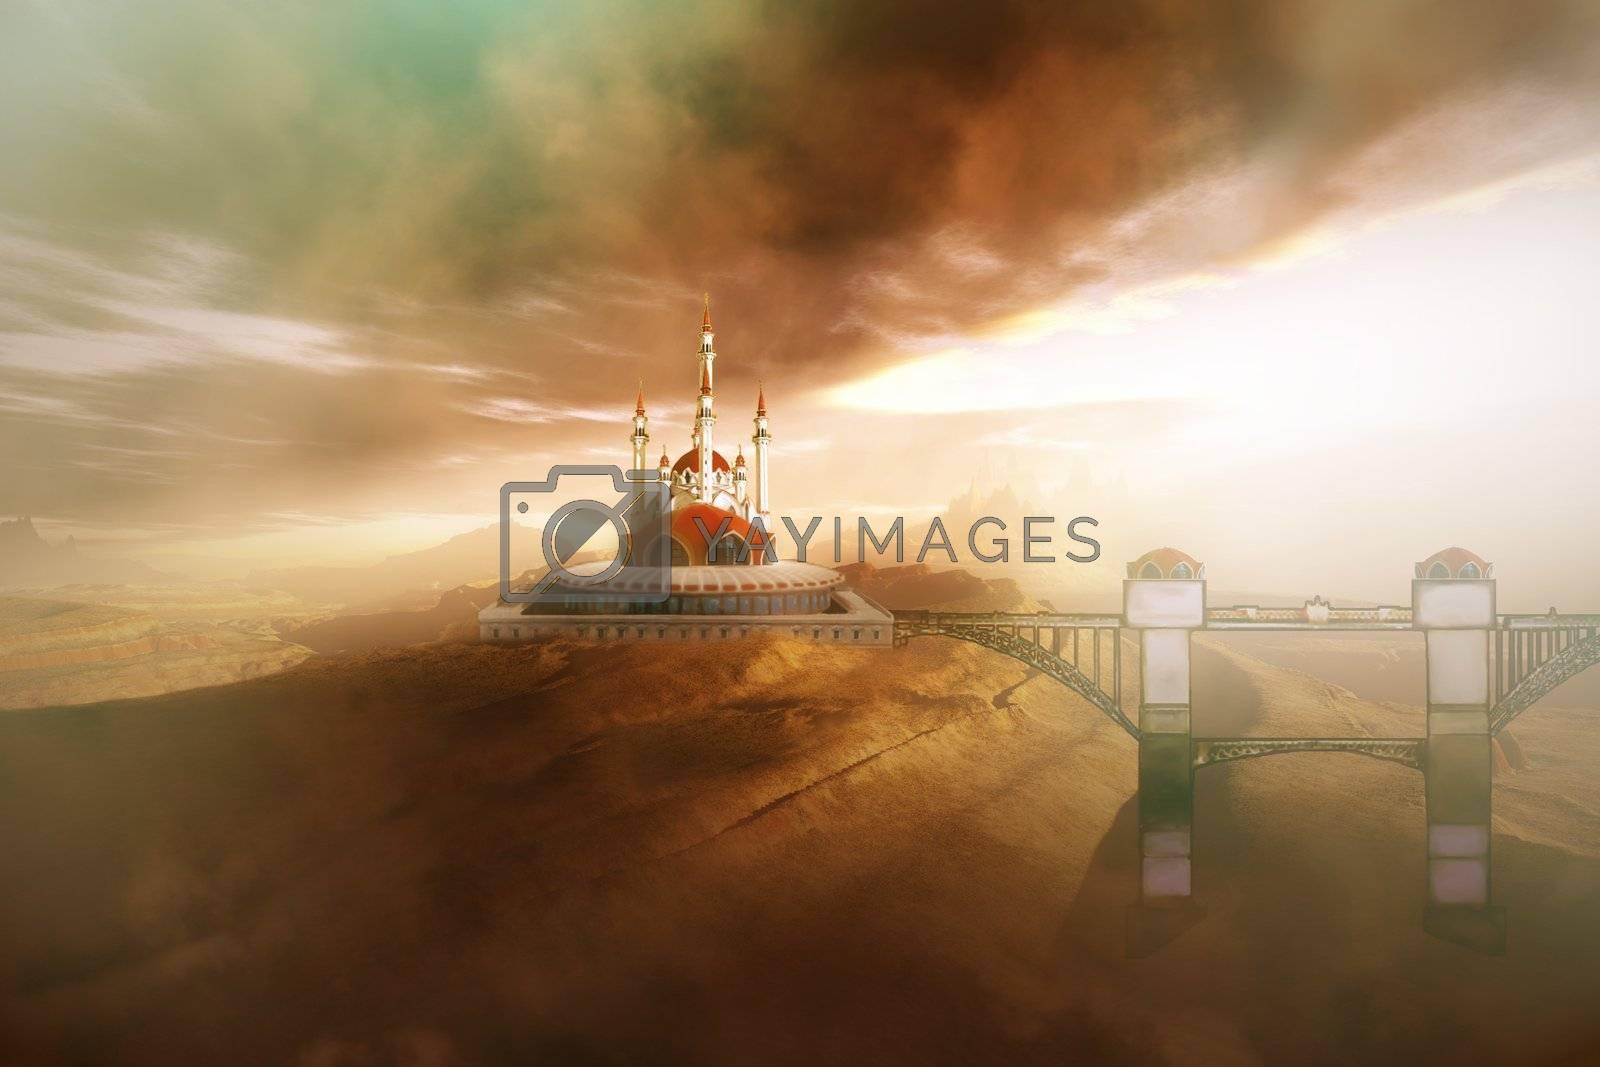 A fairytale castle with its bridge.